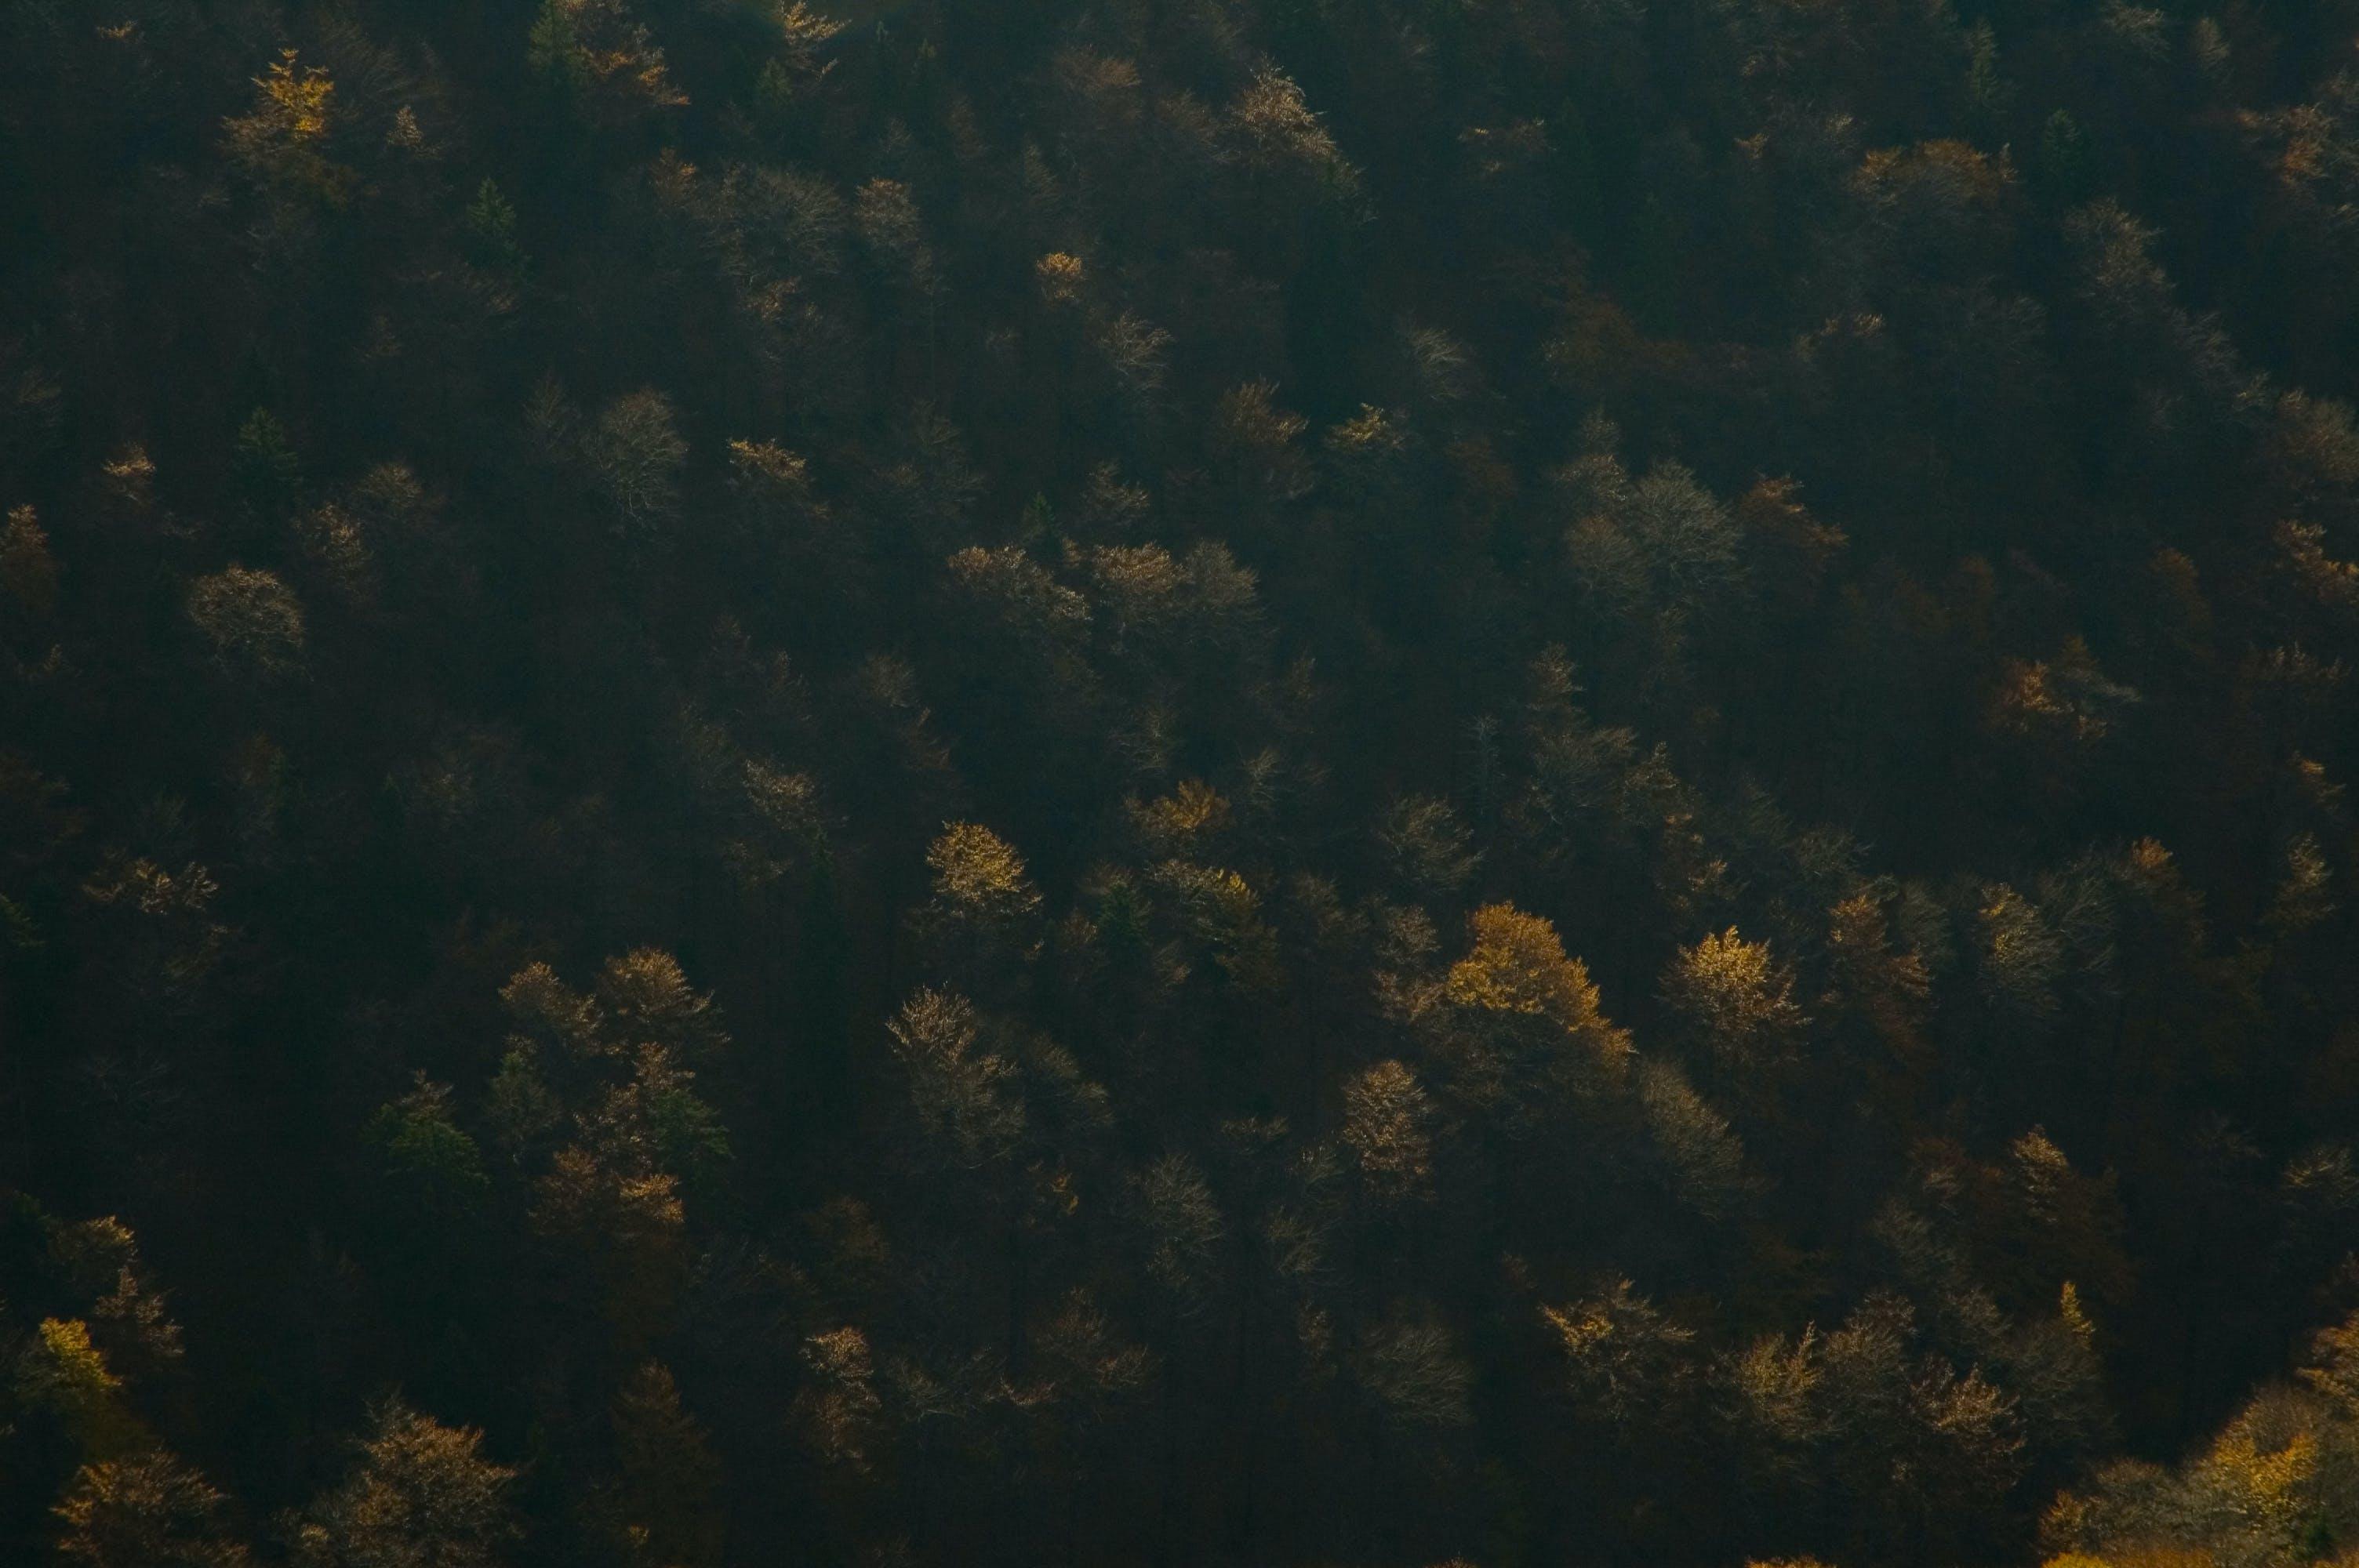 aerofotografia, árvores, escuro